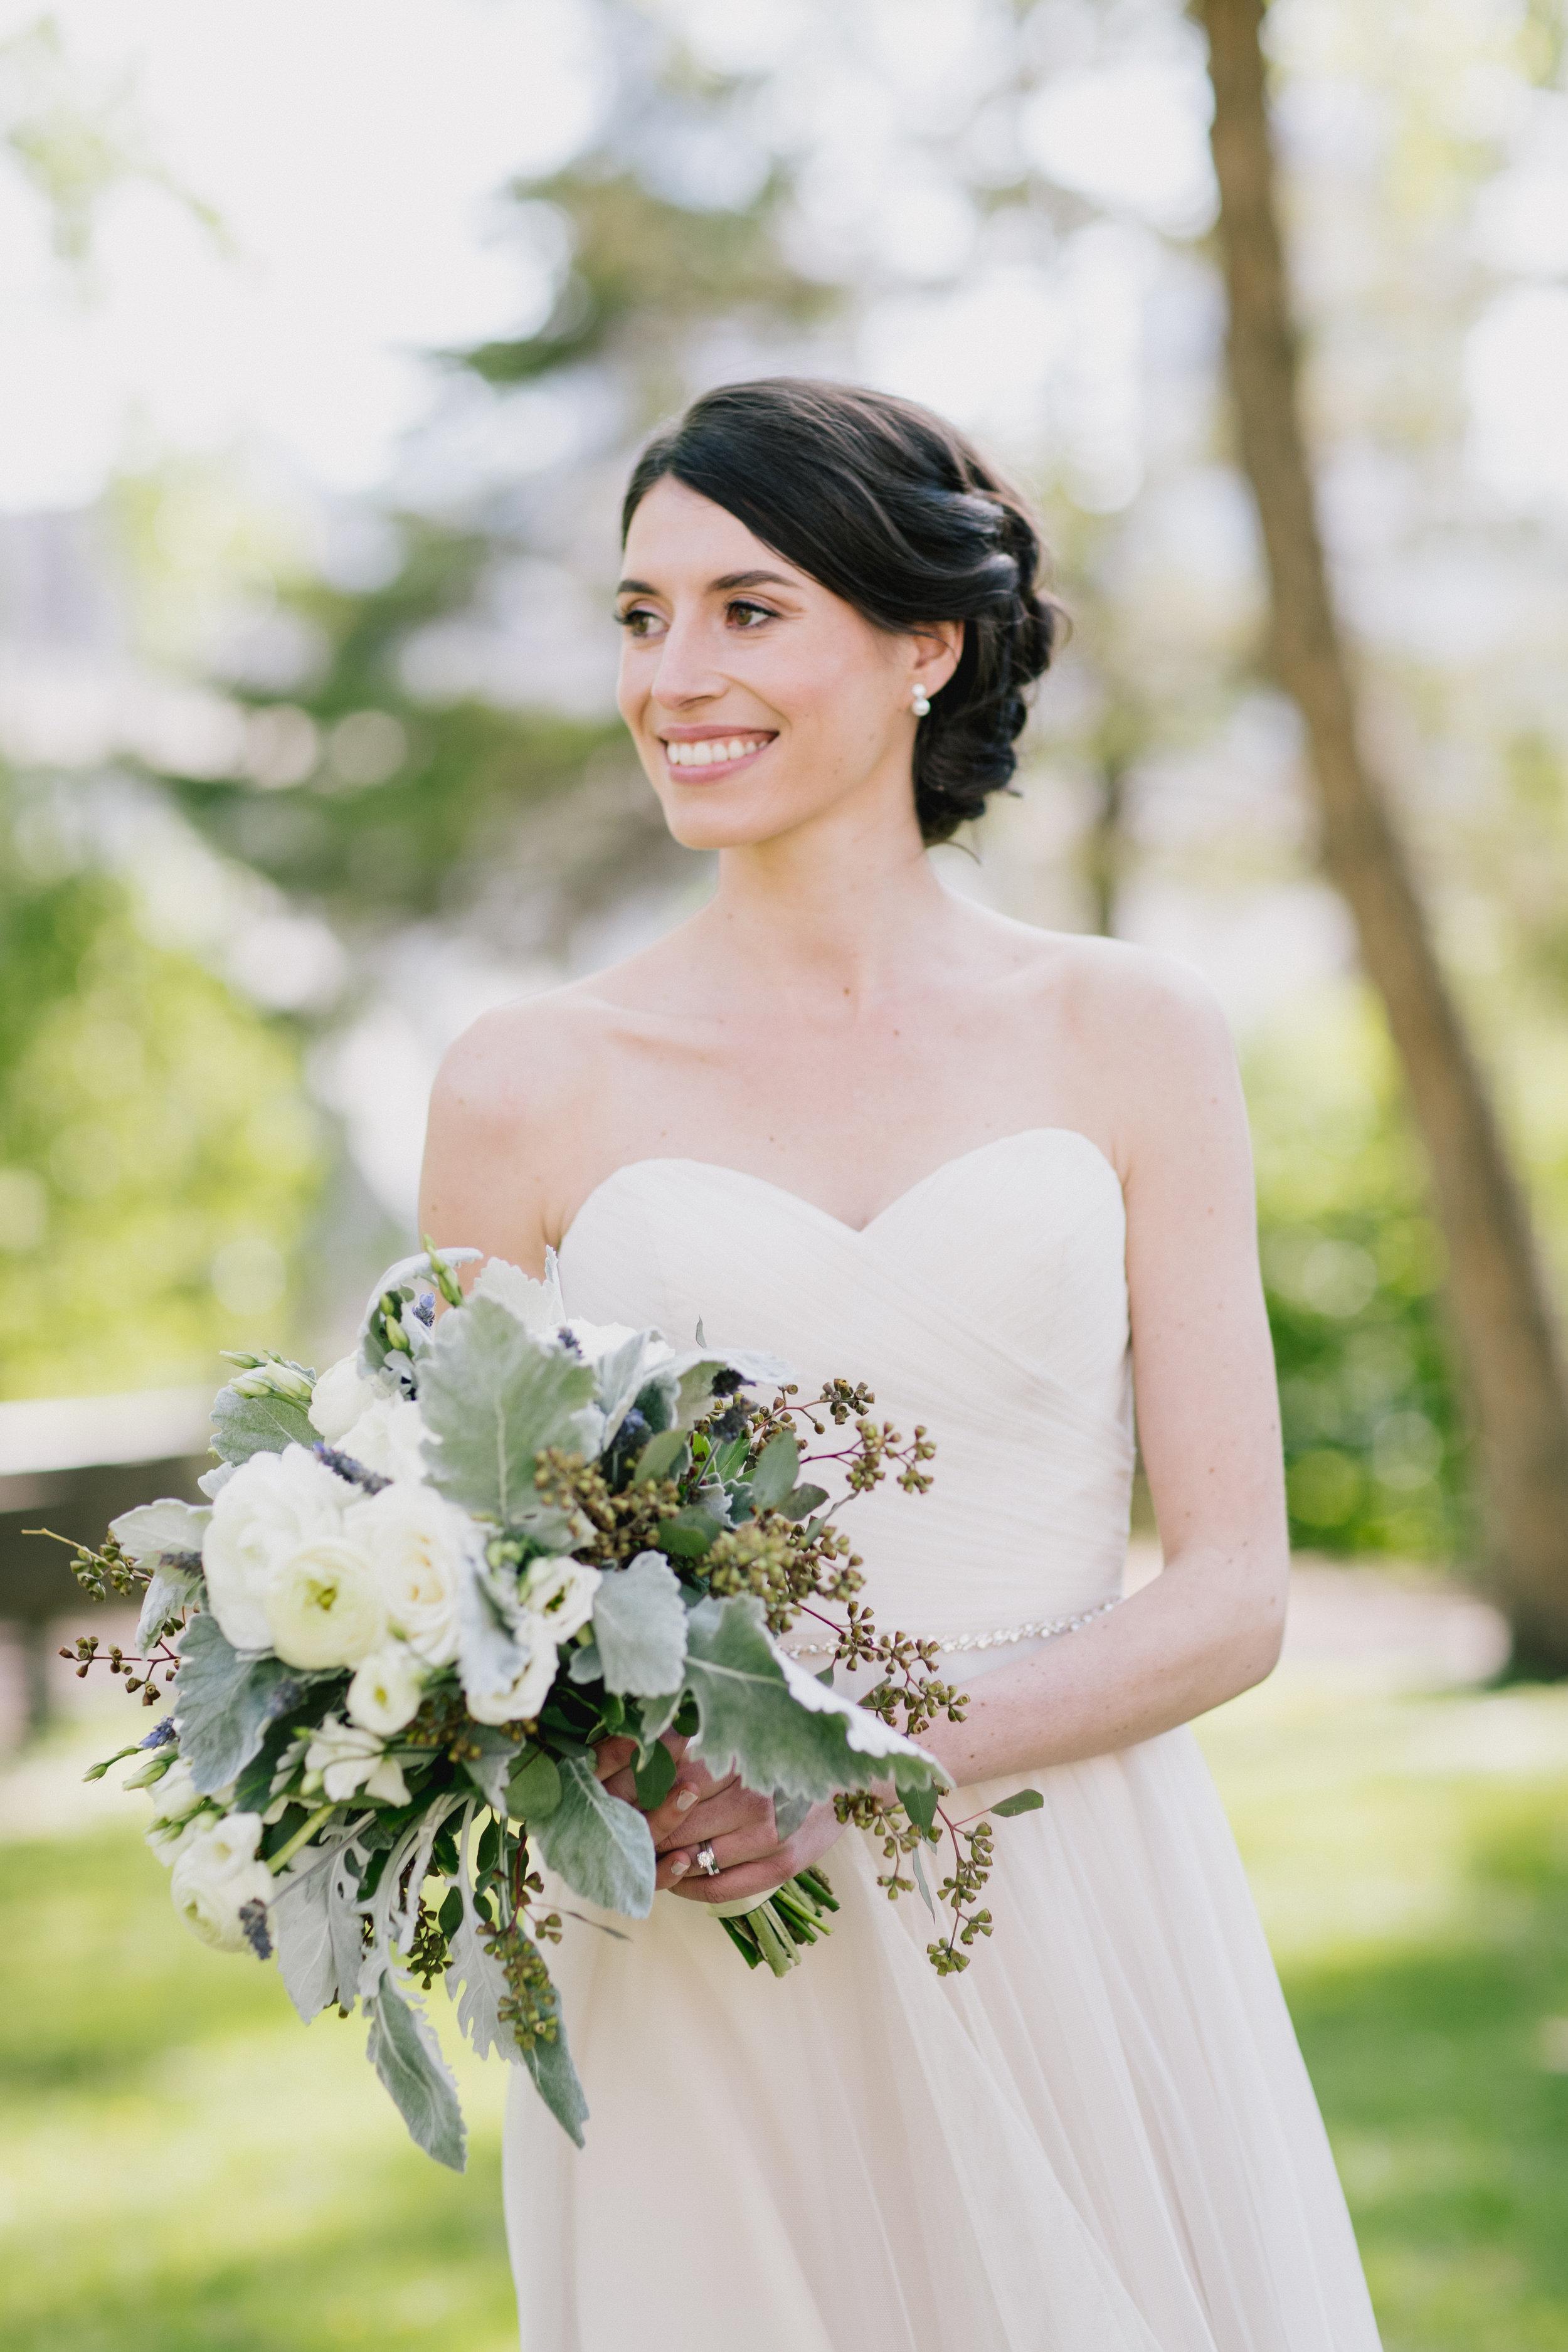 Photo by Erin Smith Weddings